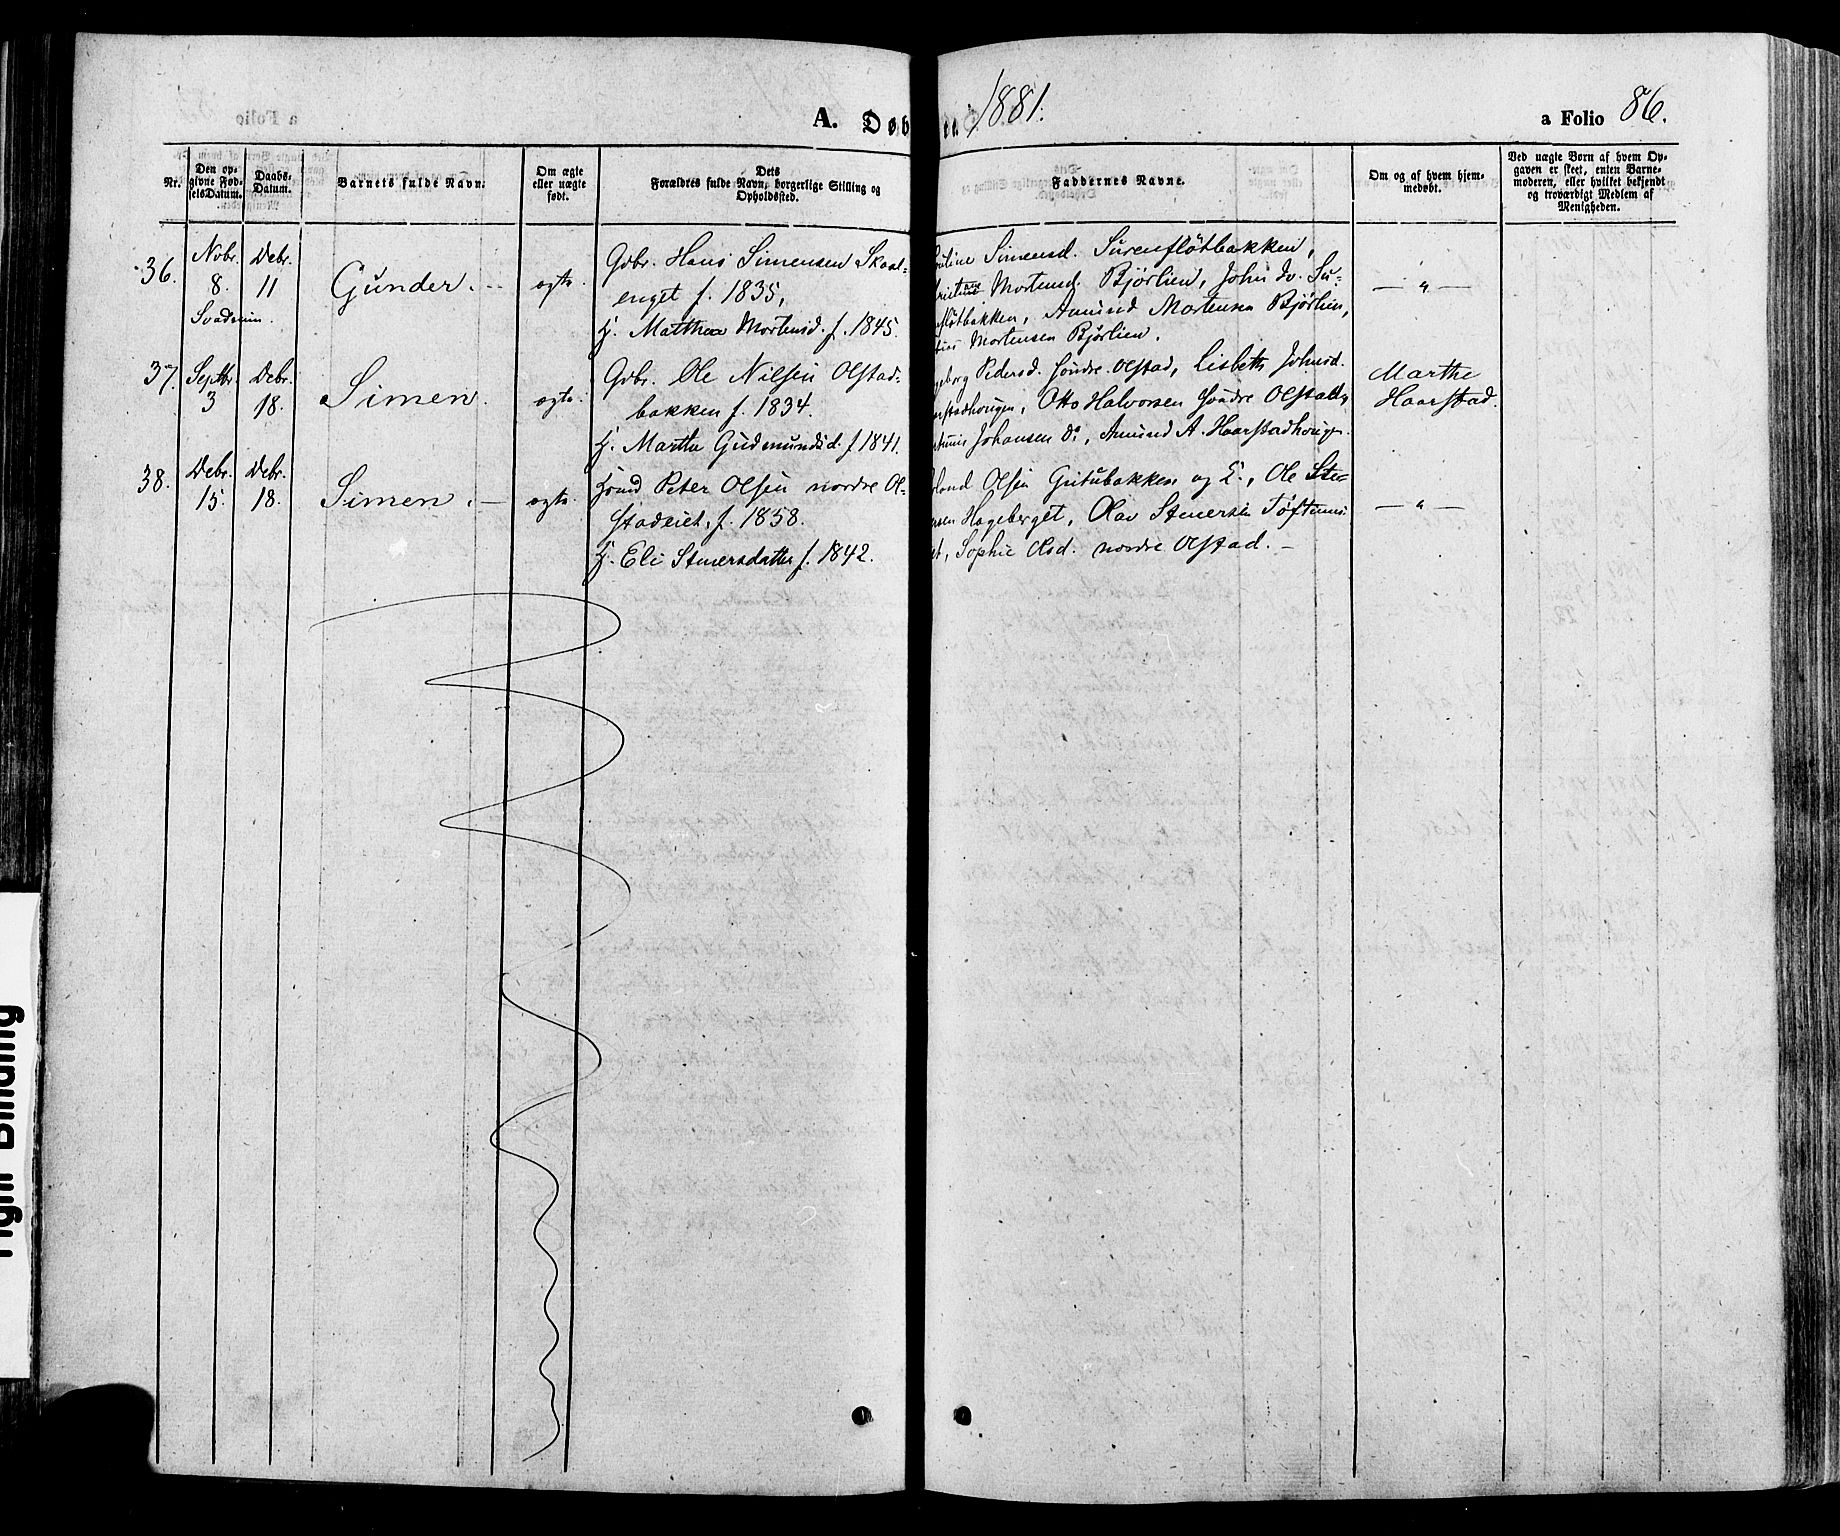 SAH, Gausdal prestekontor, Ministerialbok nr. 10, 1867-1886, s. 86